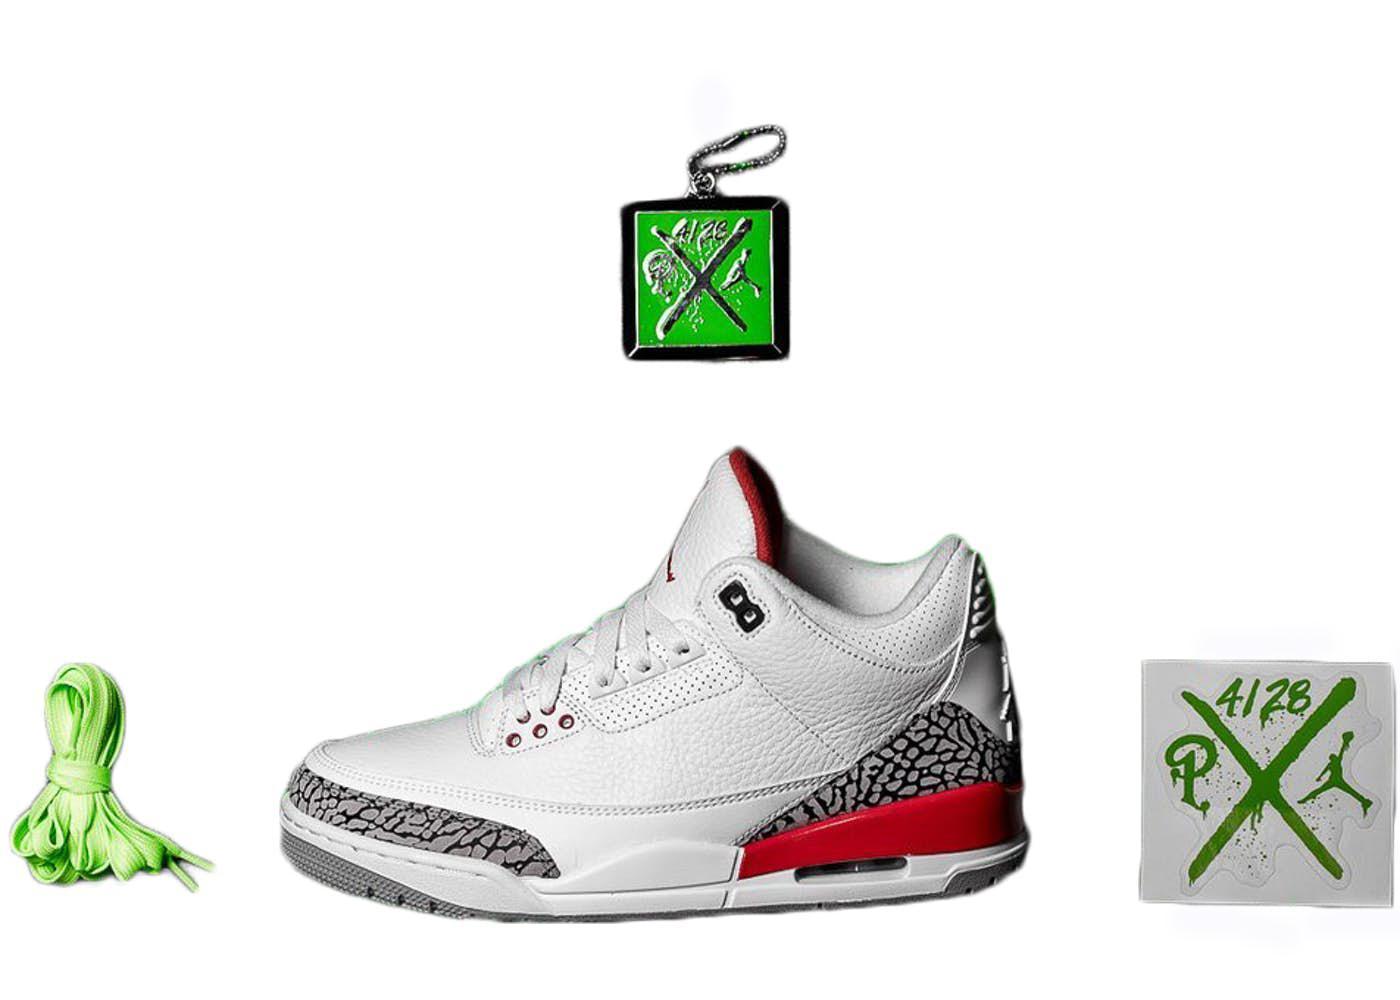 Nike Sneaker Politics